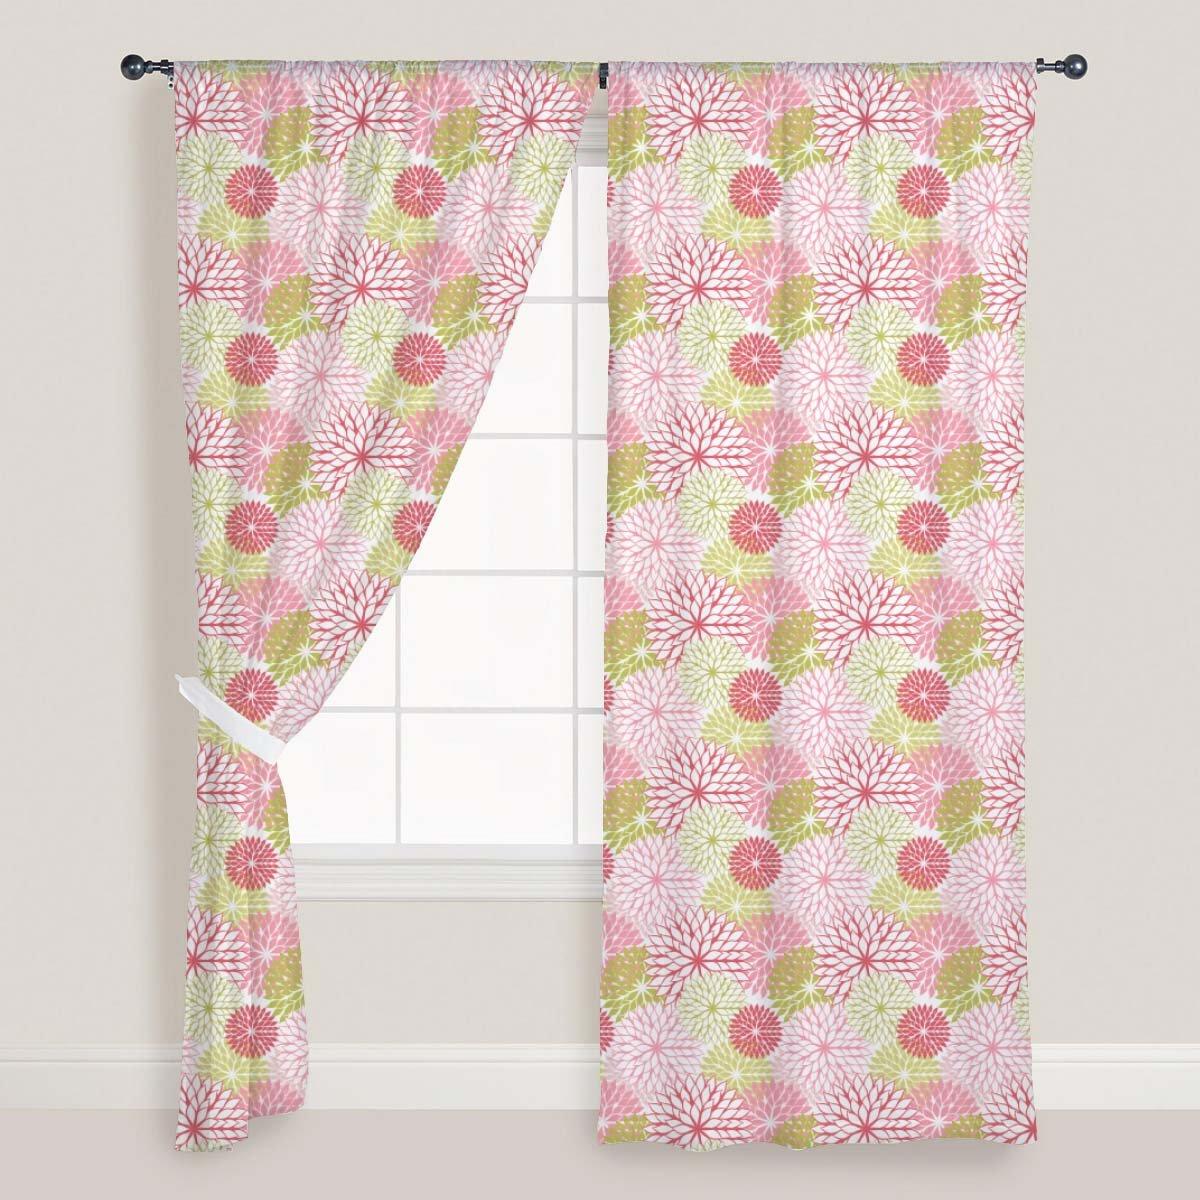 AZ Hand Draw Flowers Door & Window Curtain Satin 4feet x 9feet; SET OF 3 PCS